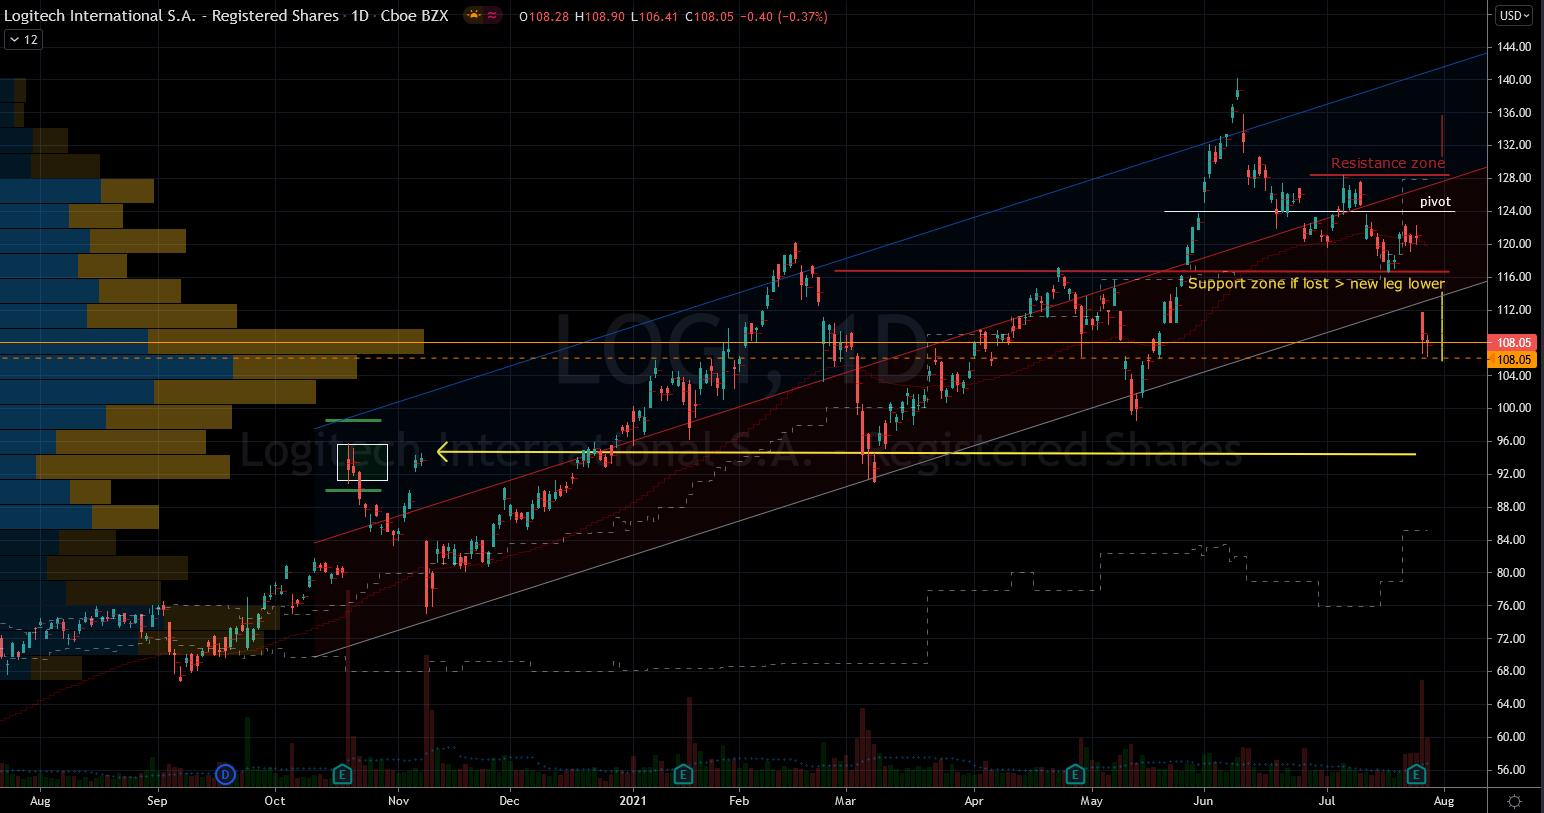 Stocks to Buy: Logitech (LOGI) Stock Chart Showing Potential Base